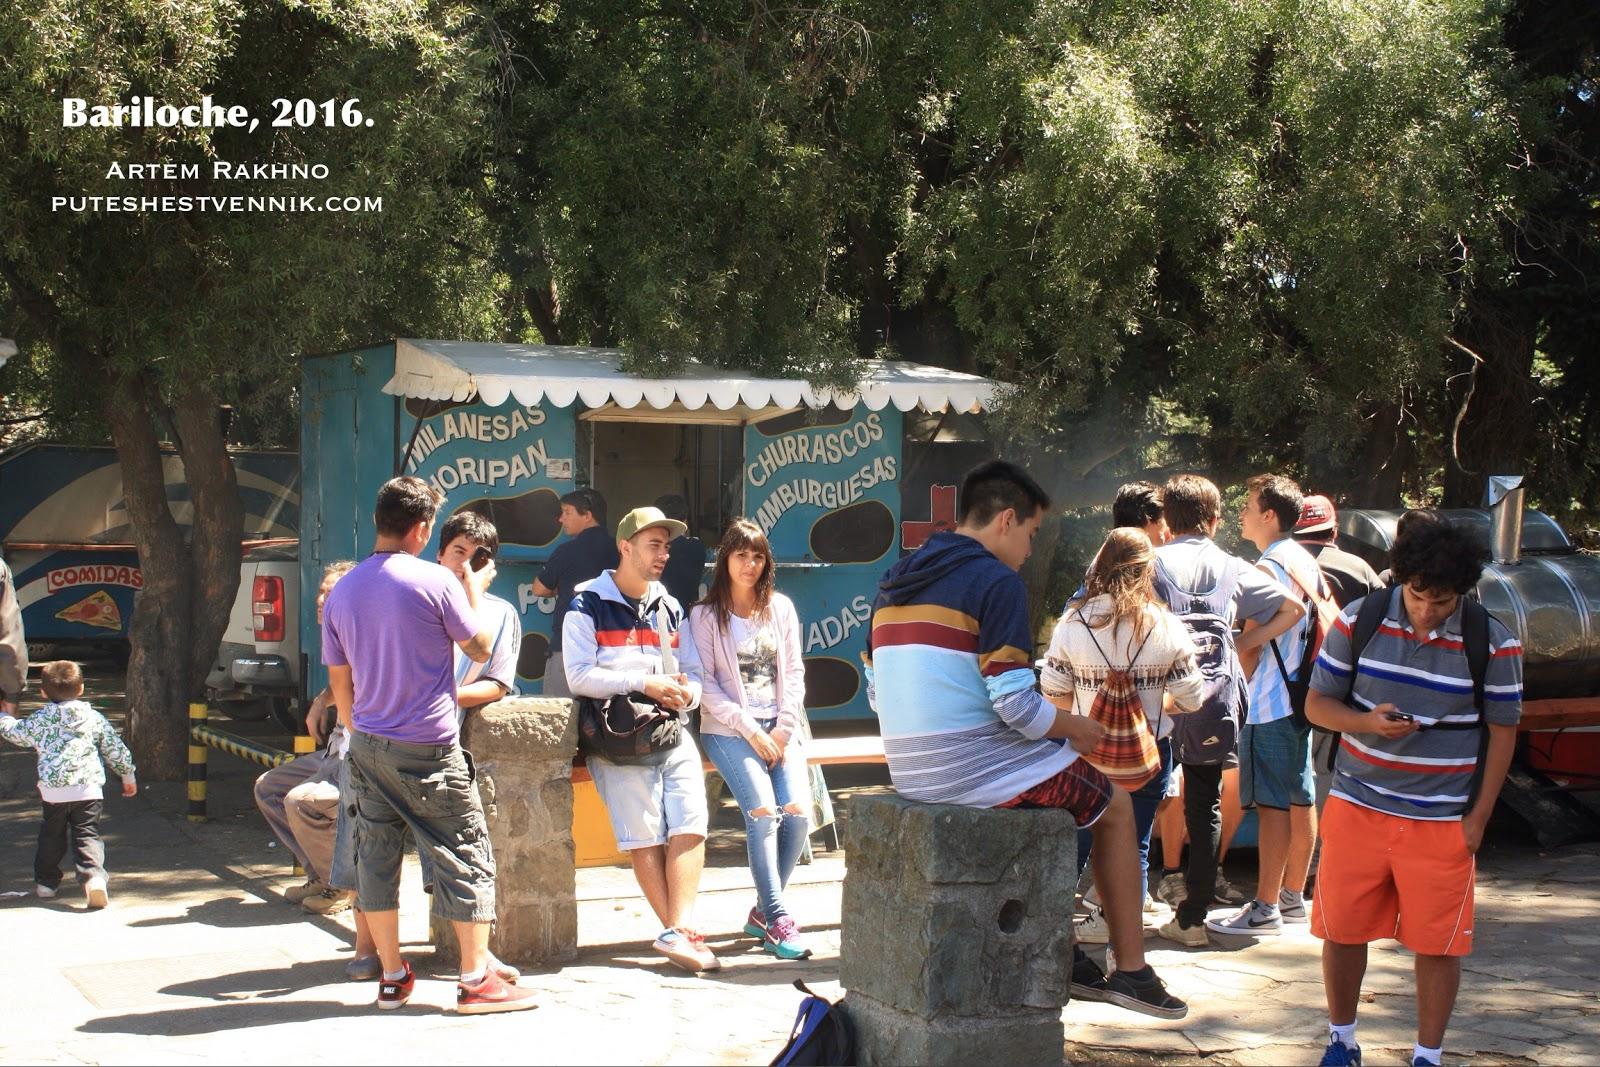 Аргентинцы на улице в Барилоче